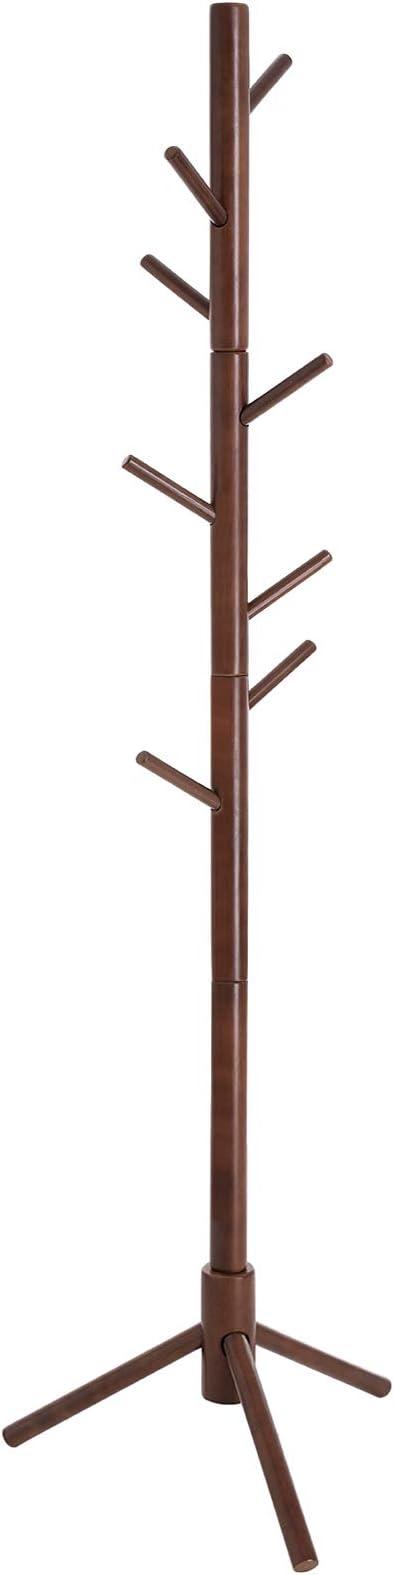 Brown Bag Umbrella Hanging Organiser for Hallway Bedroom Waiting Room Living Room Hallway Tree Coat Rack Stand with 8 Hooks Wood Coat Rack Free Standing